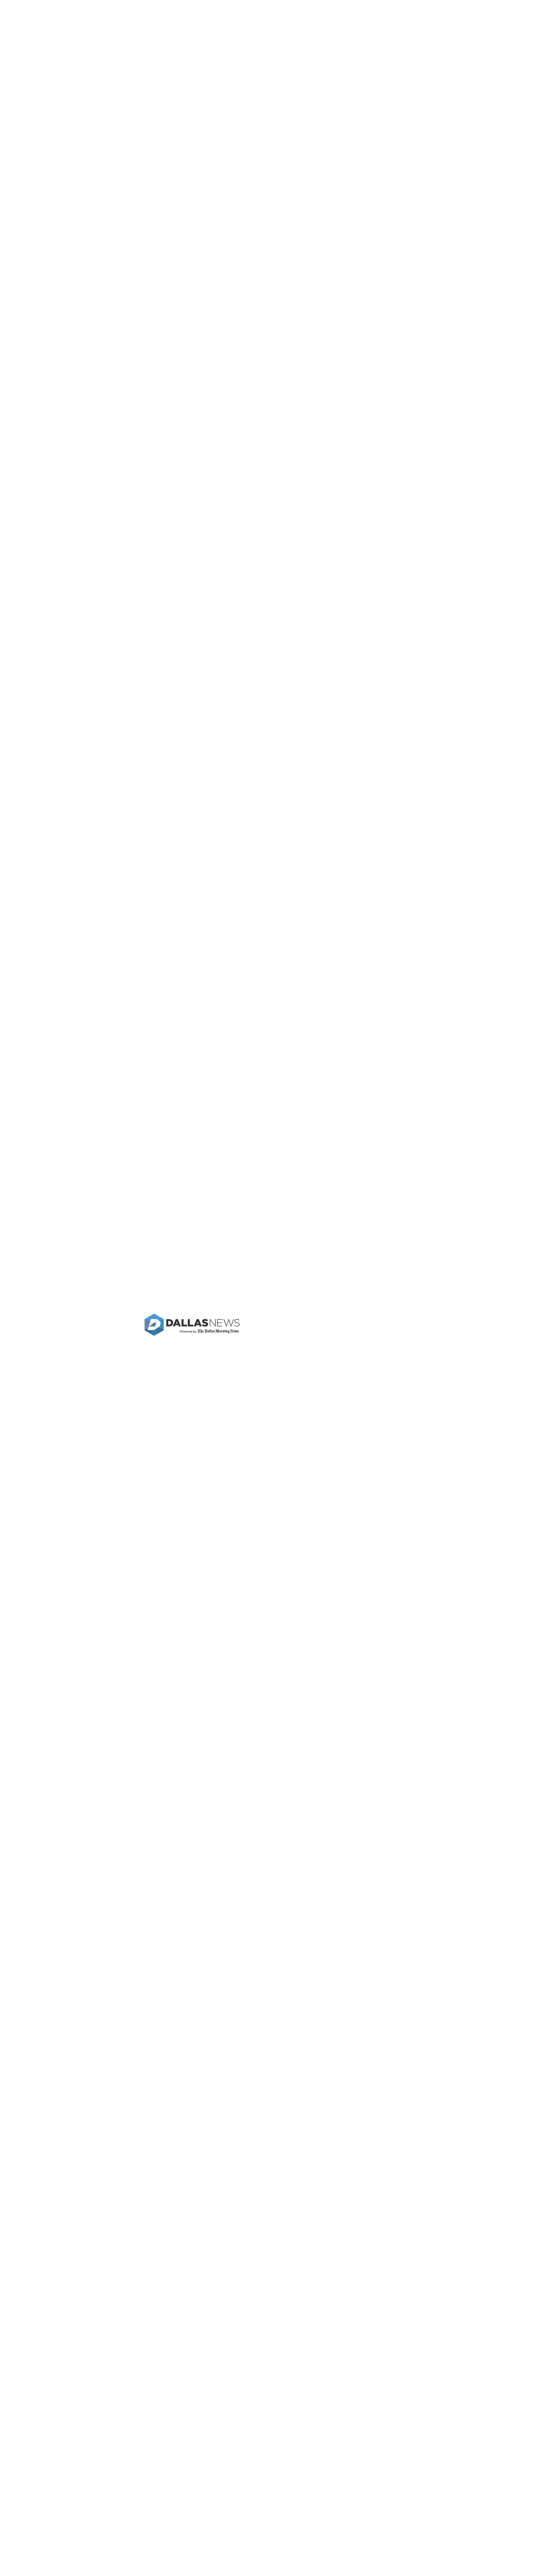 dallasnews.com at Sunday March 11, 2018, 11:03 p.m. UTC